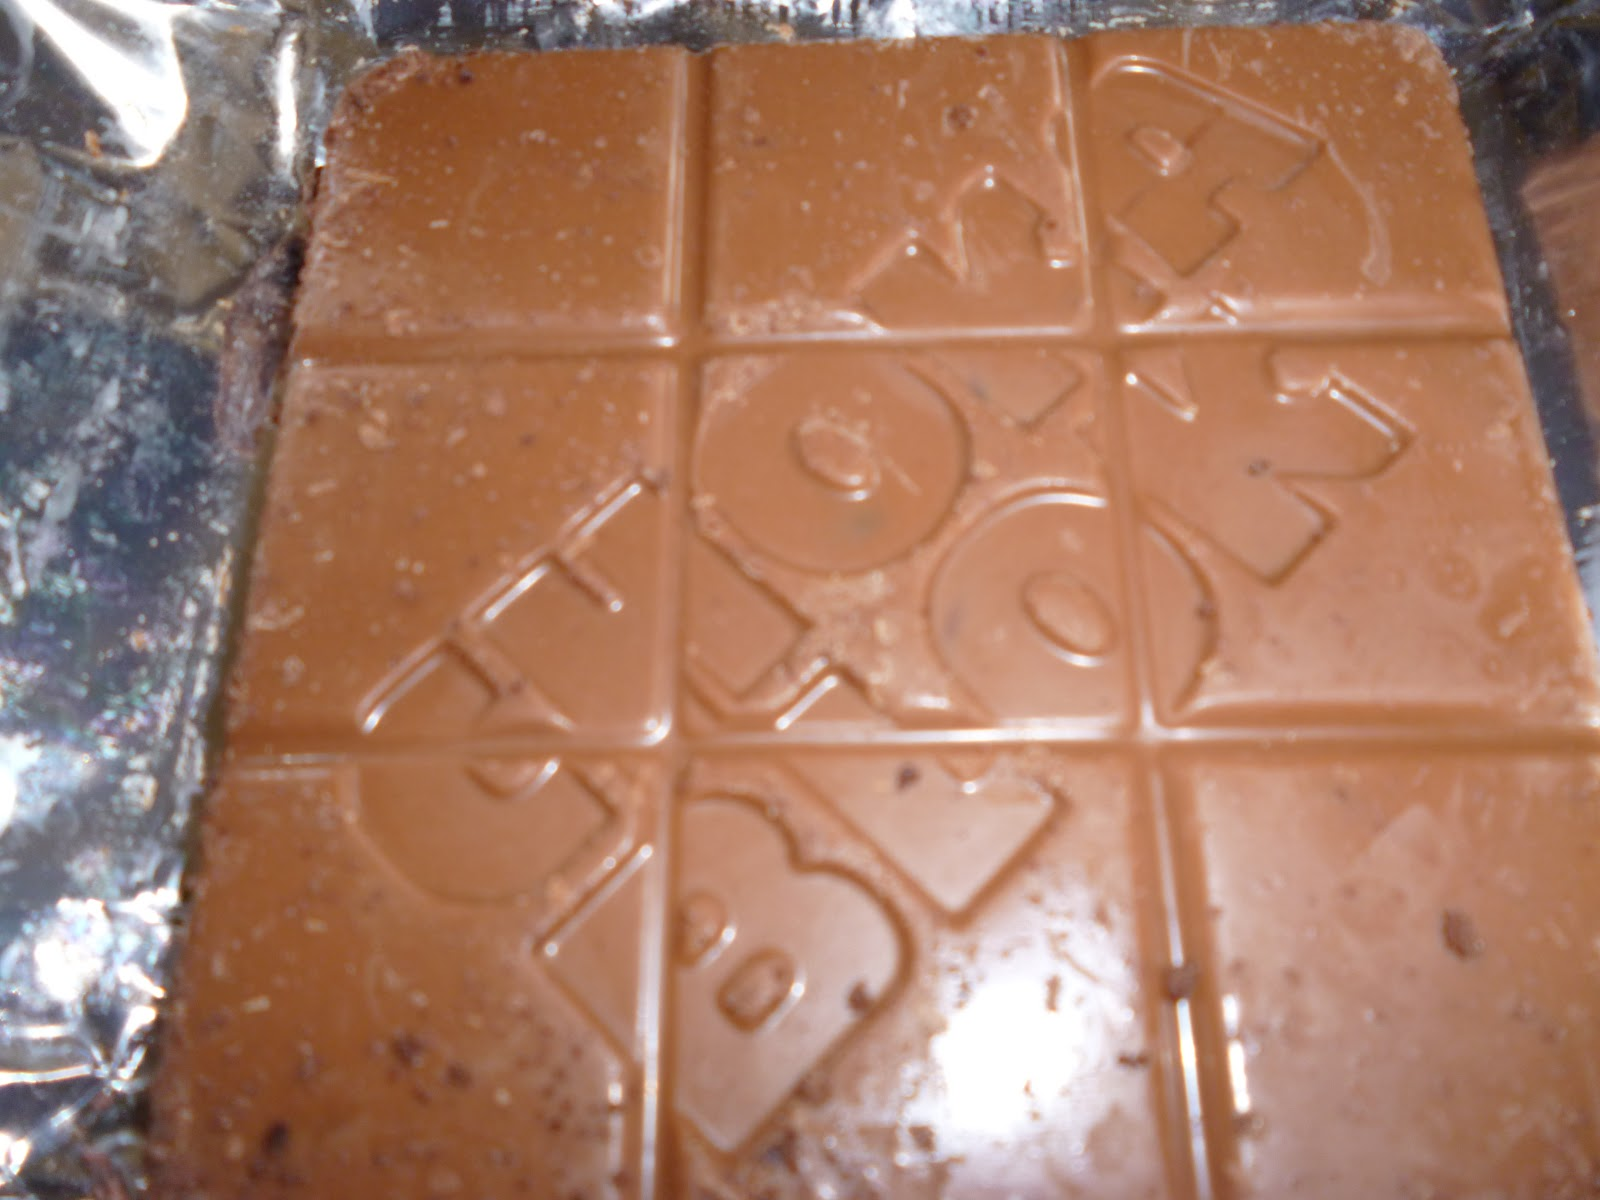 537d3f72f2dab Madhouse Family Reviews: Chokablok chocolate review